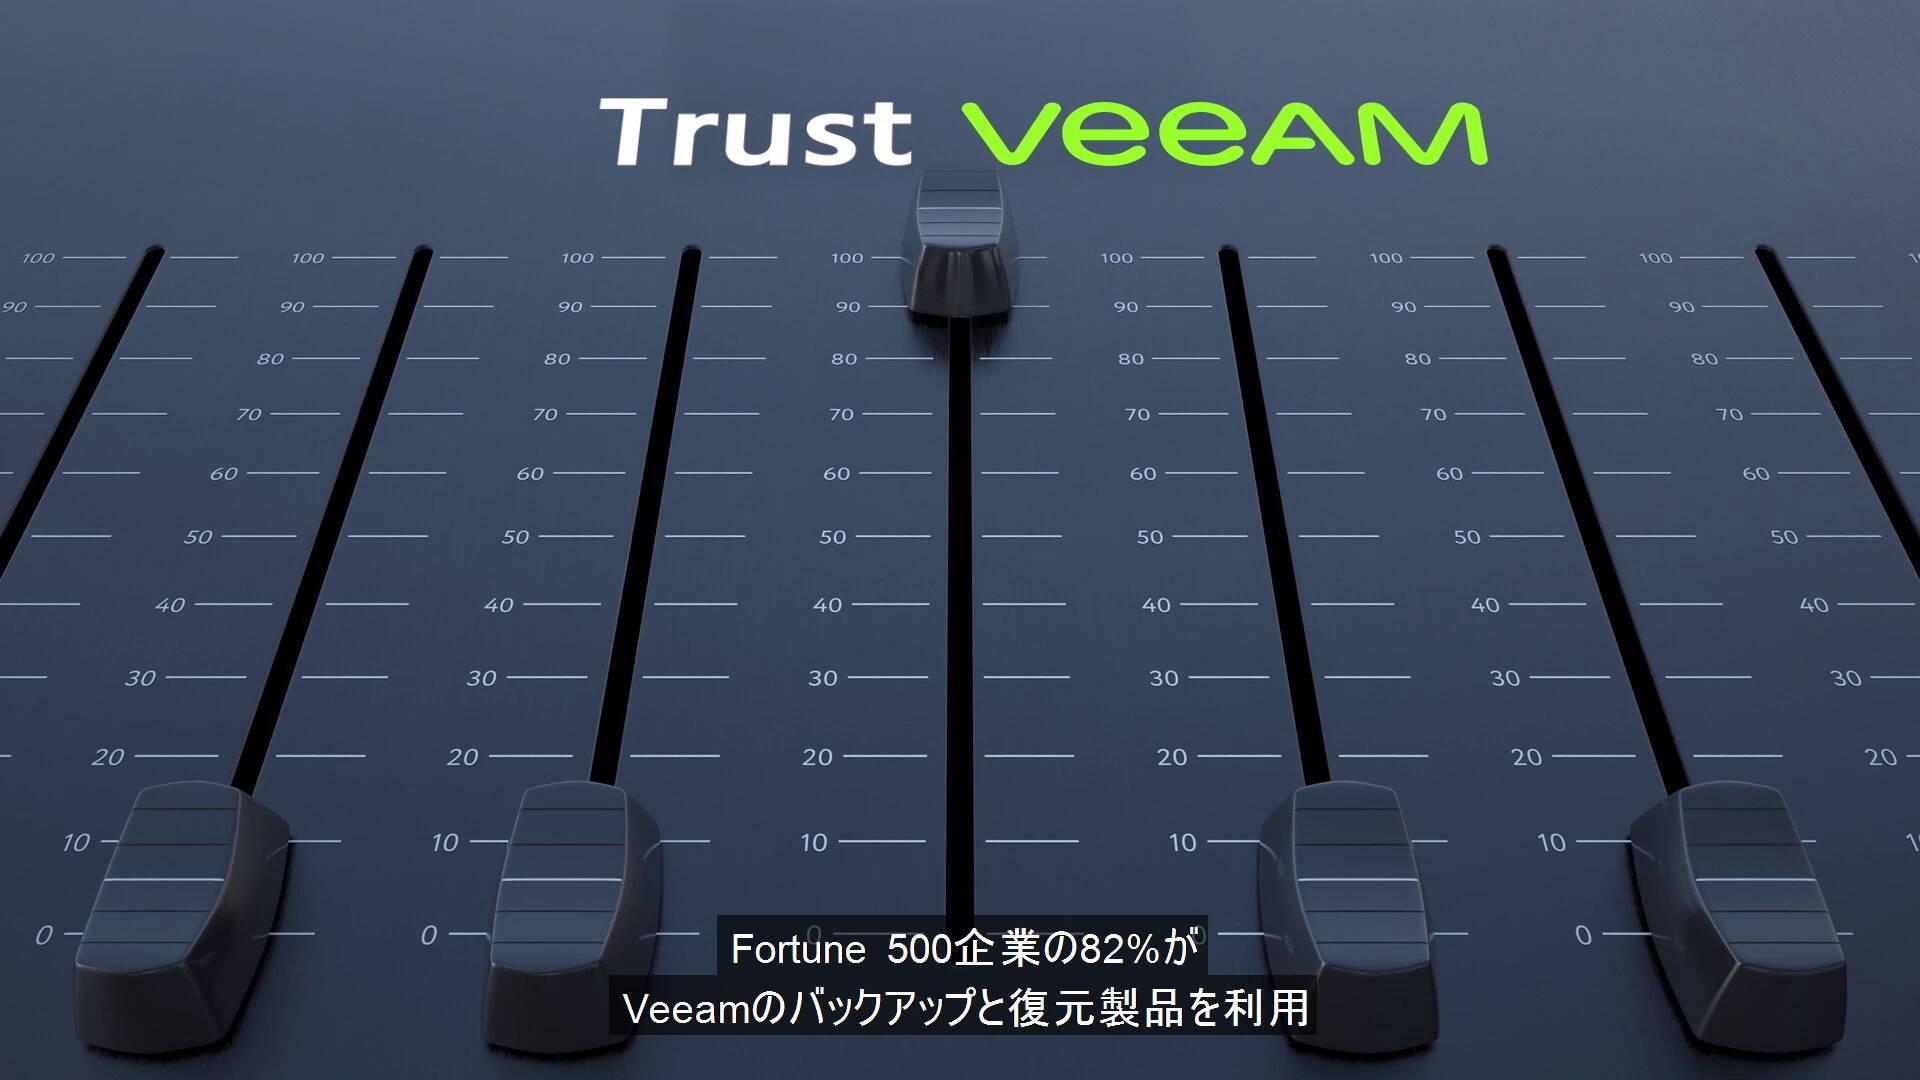 JP Corporate Messaging Why Veeam - Feb 2020